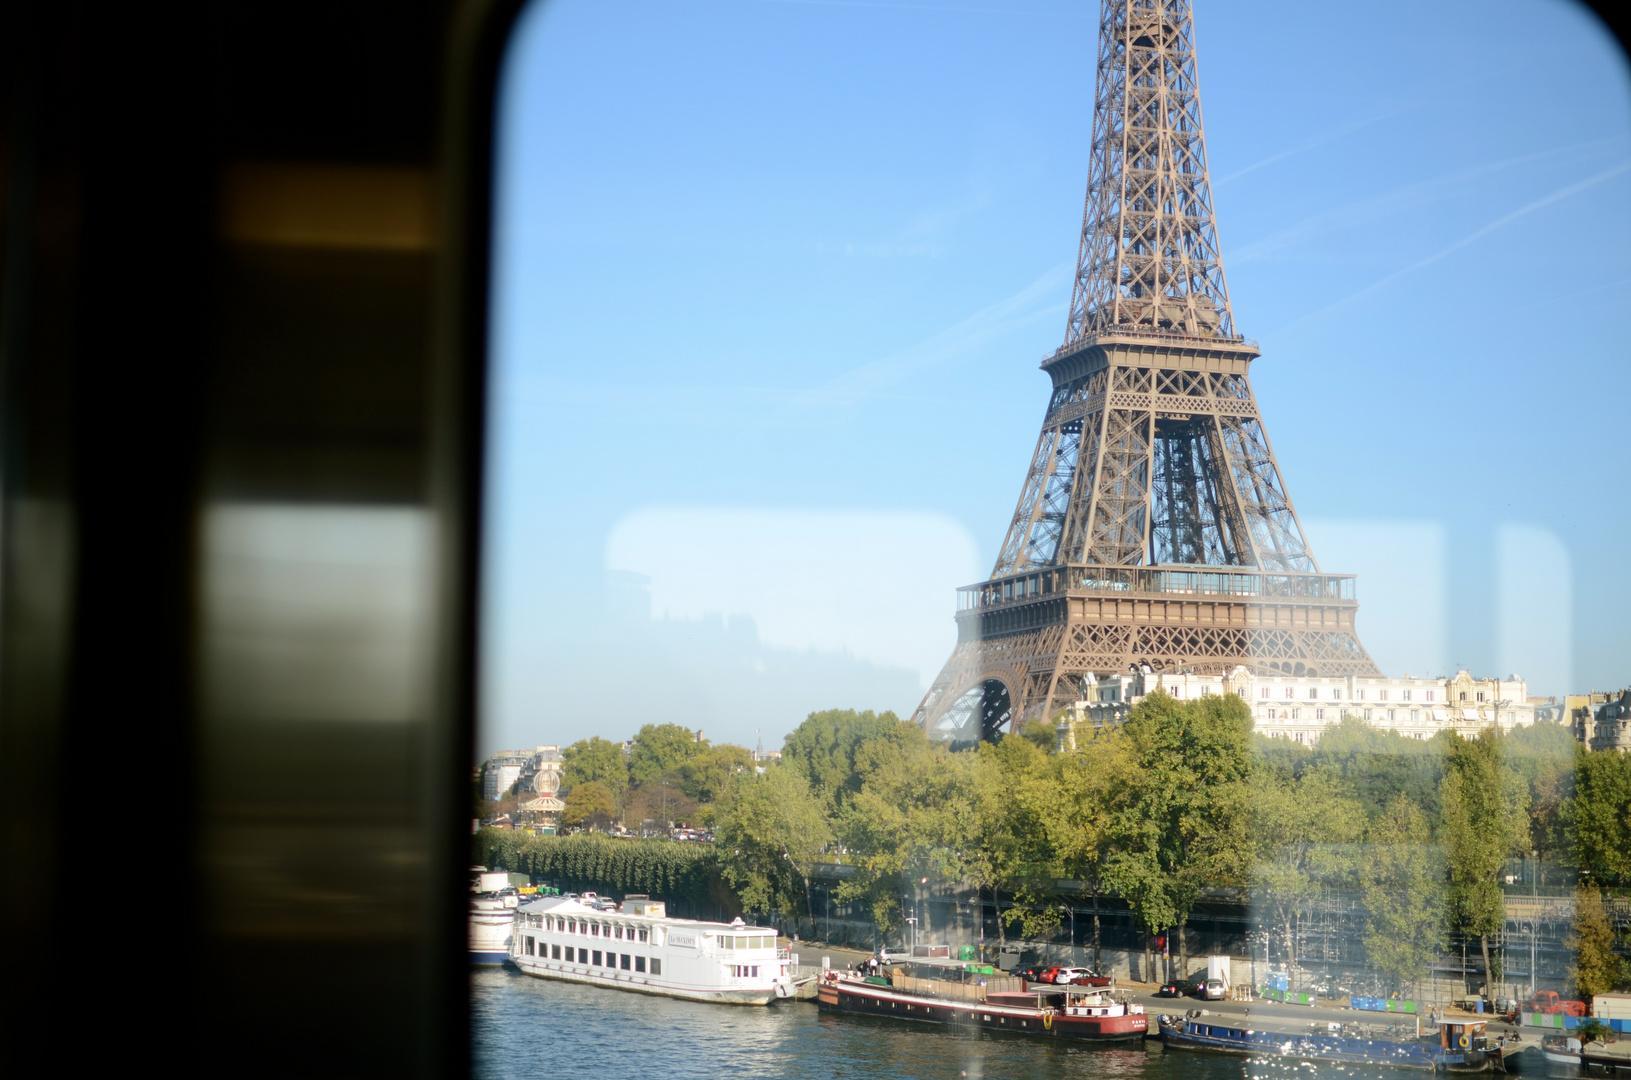 Der Eiffelturm mal anders